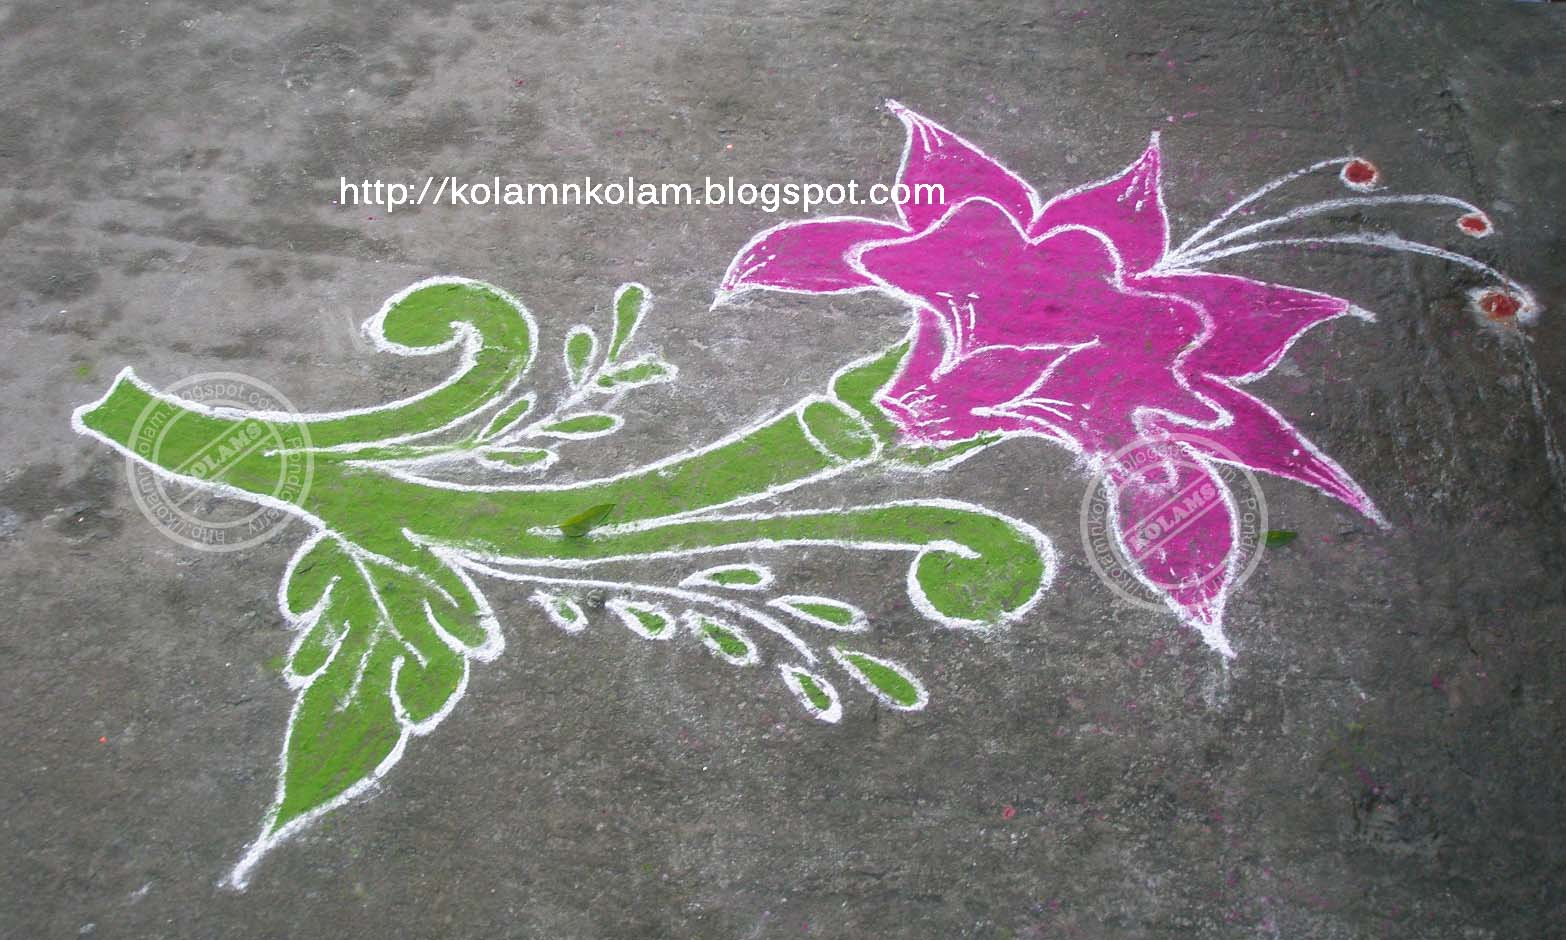 Part 02 New Year 2011 Kolam